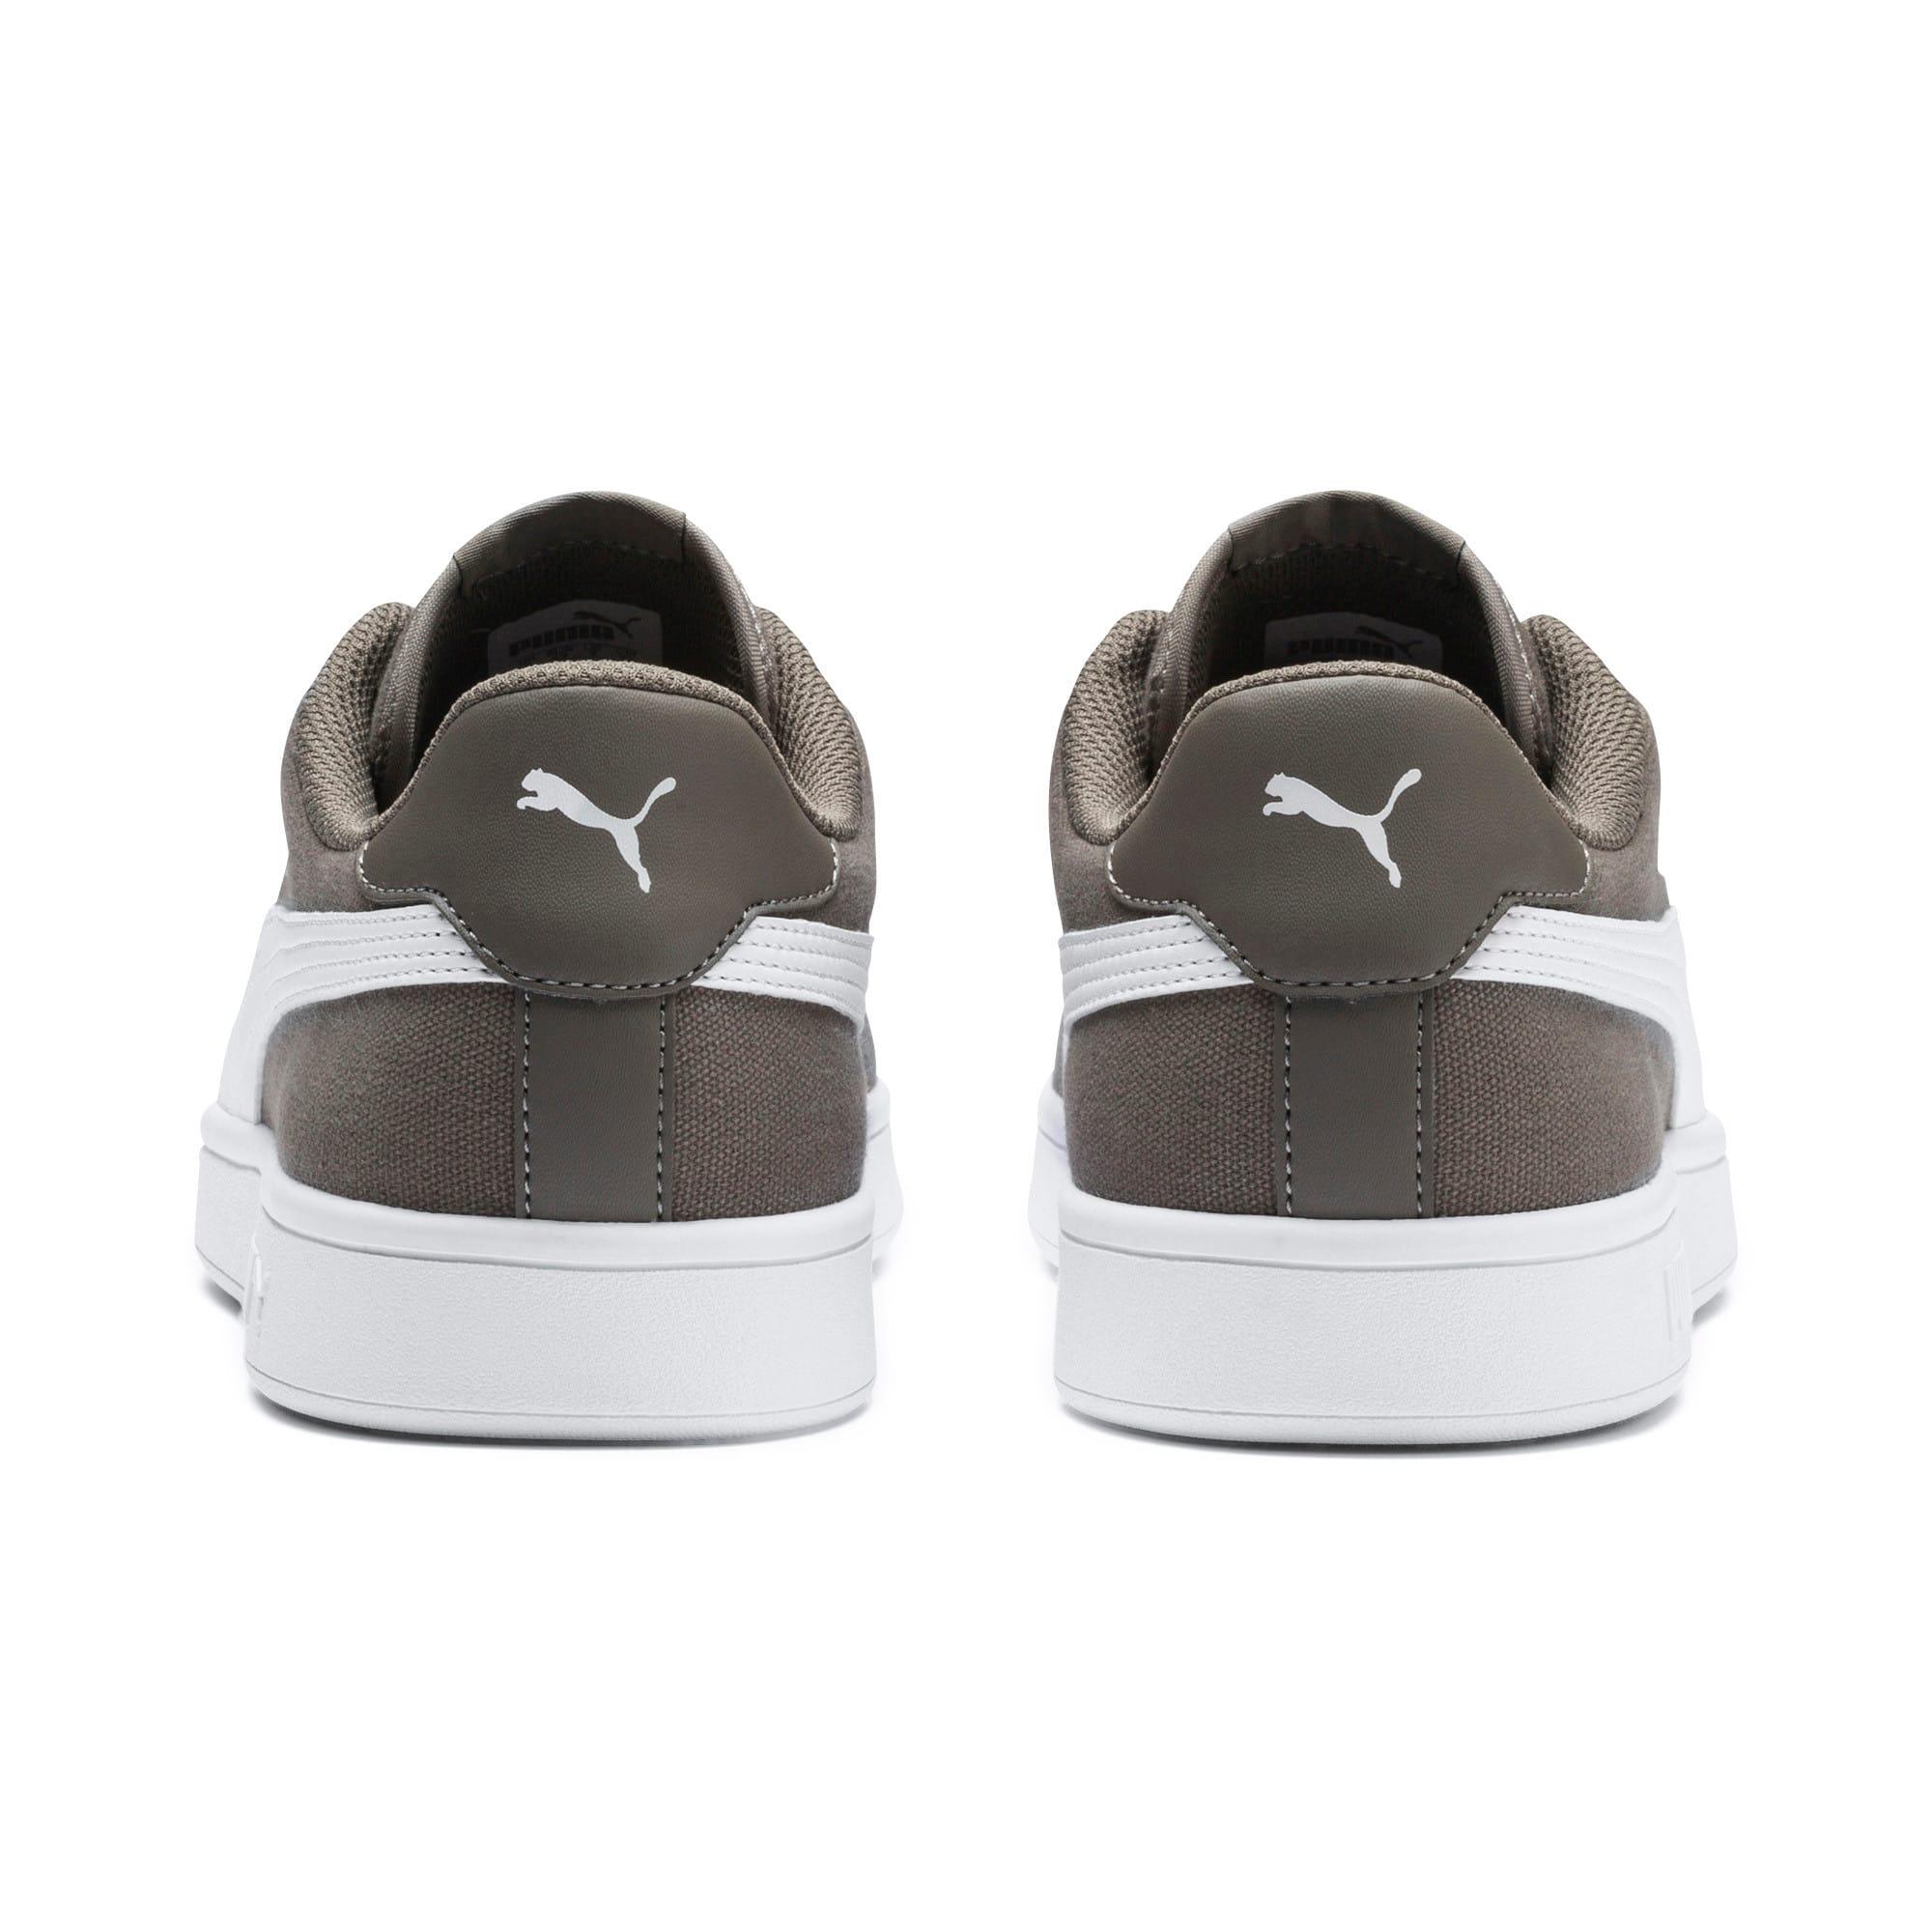 Thumbnail 4 of PUMA Smash v2 Canvas Sneakers, Charcoal Gray-Puma White, medium